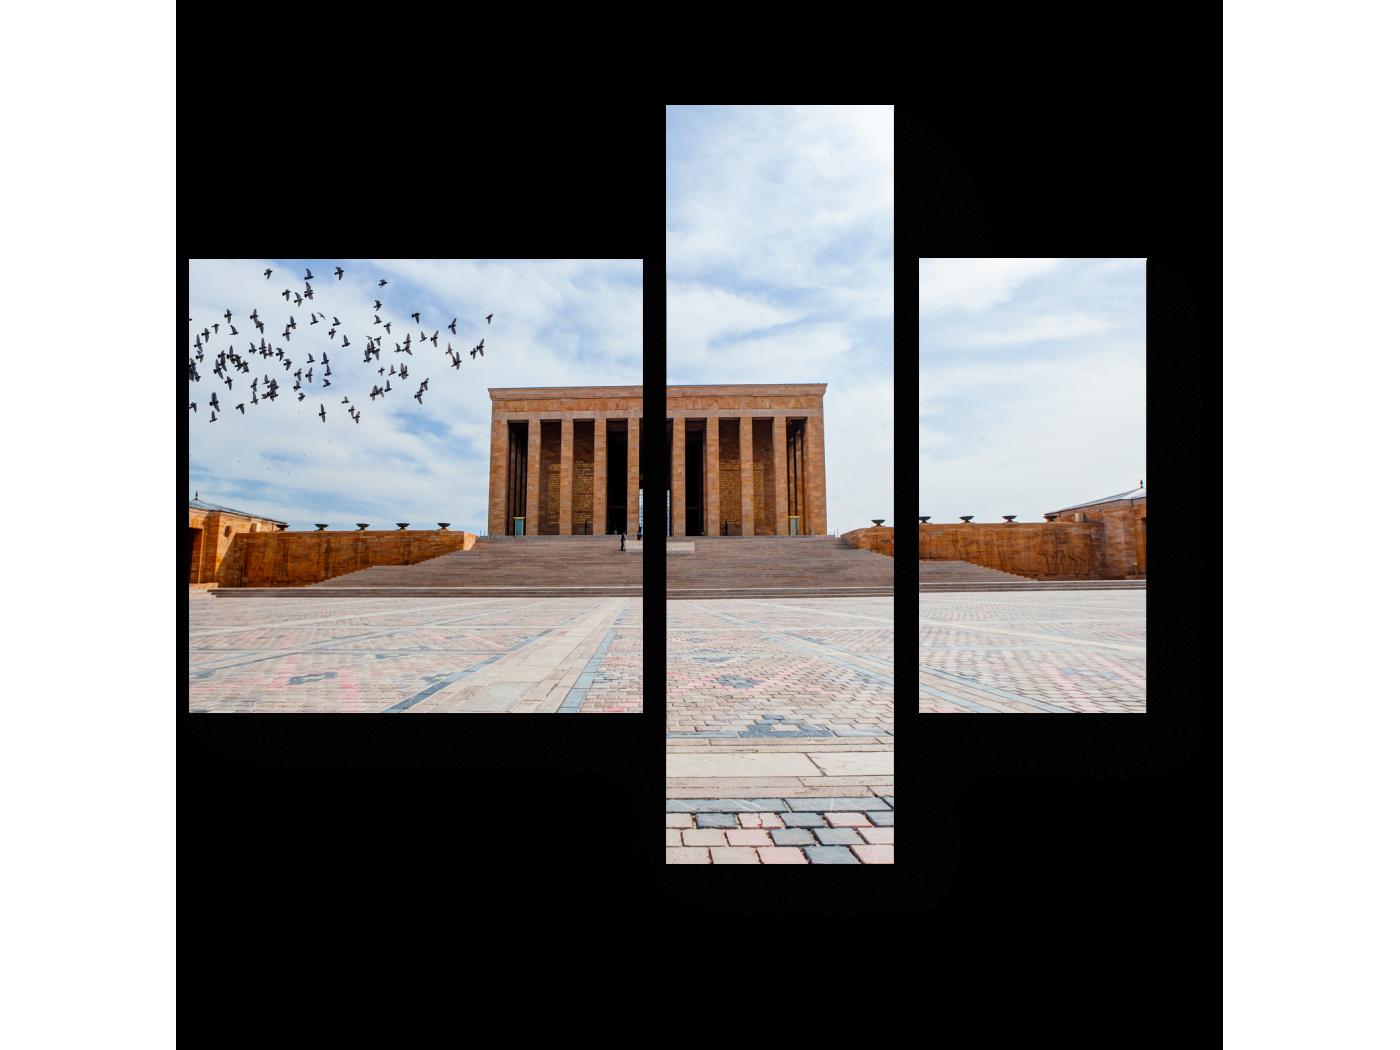 Модульная картина Мавзолей Ататюрка (80x66) фото